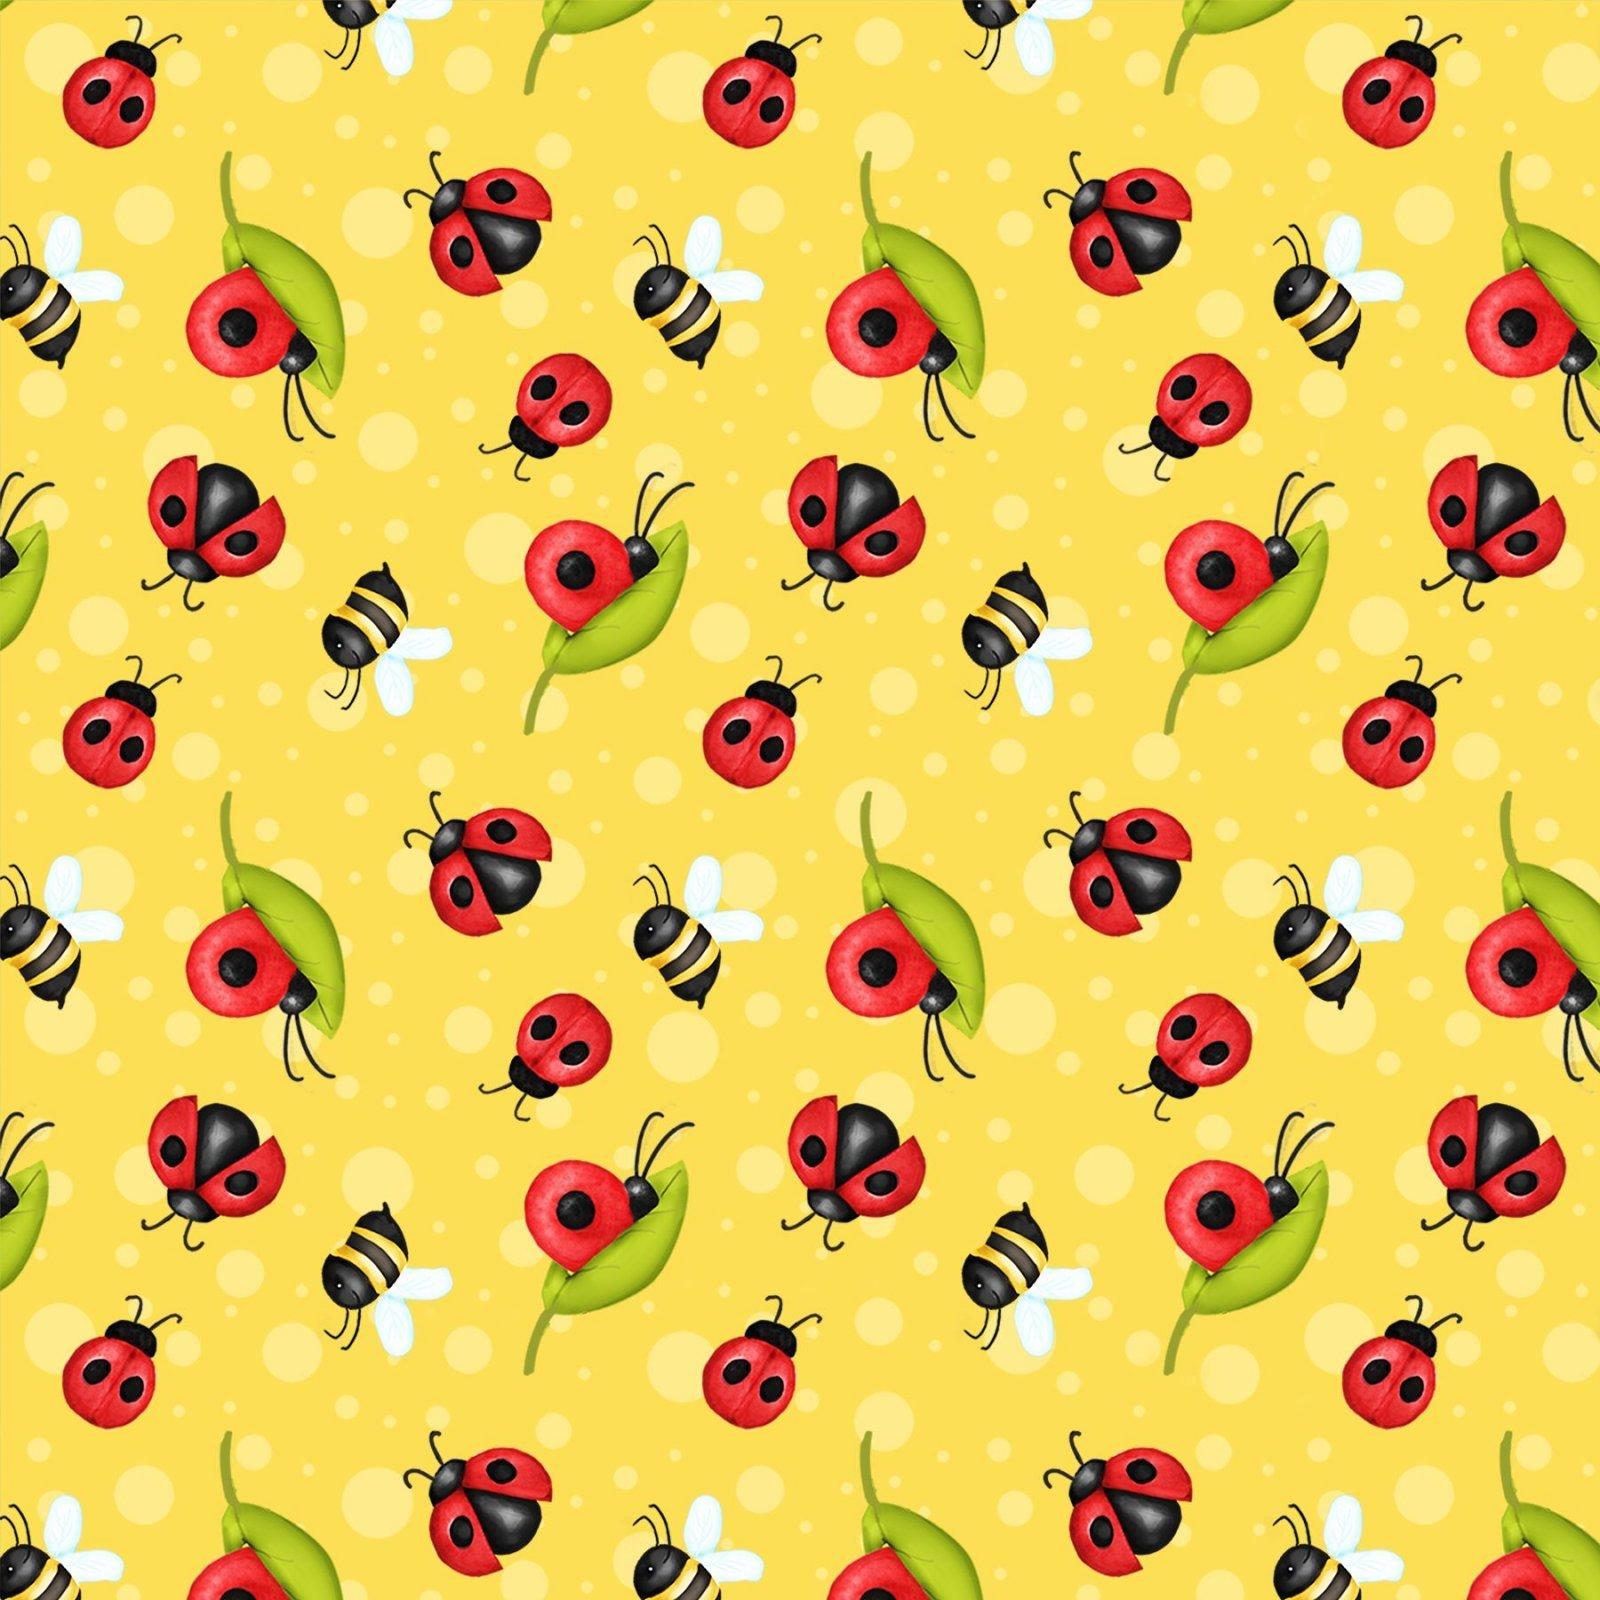 Gnome Garden 9445-44 Ladybugs Yellow